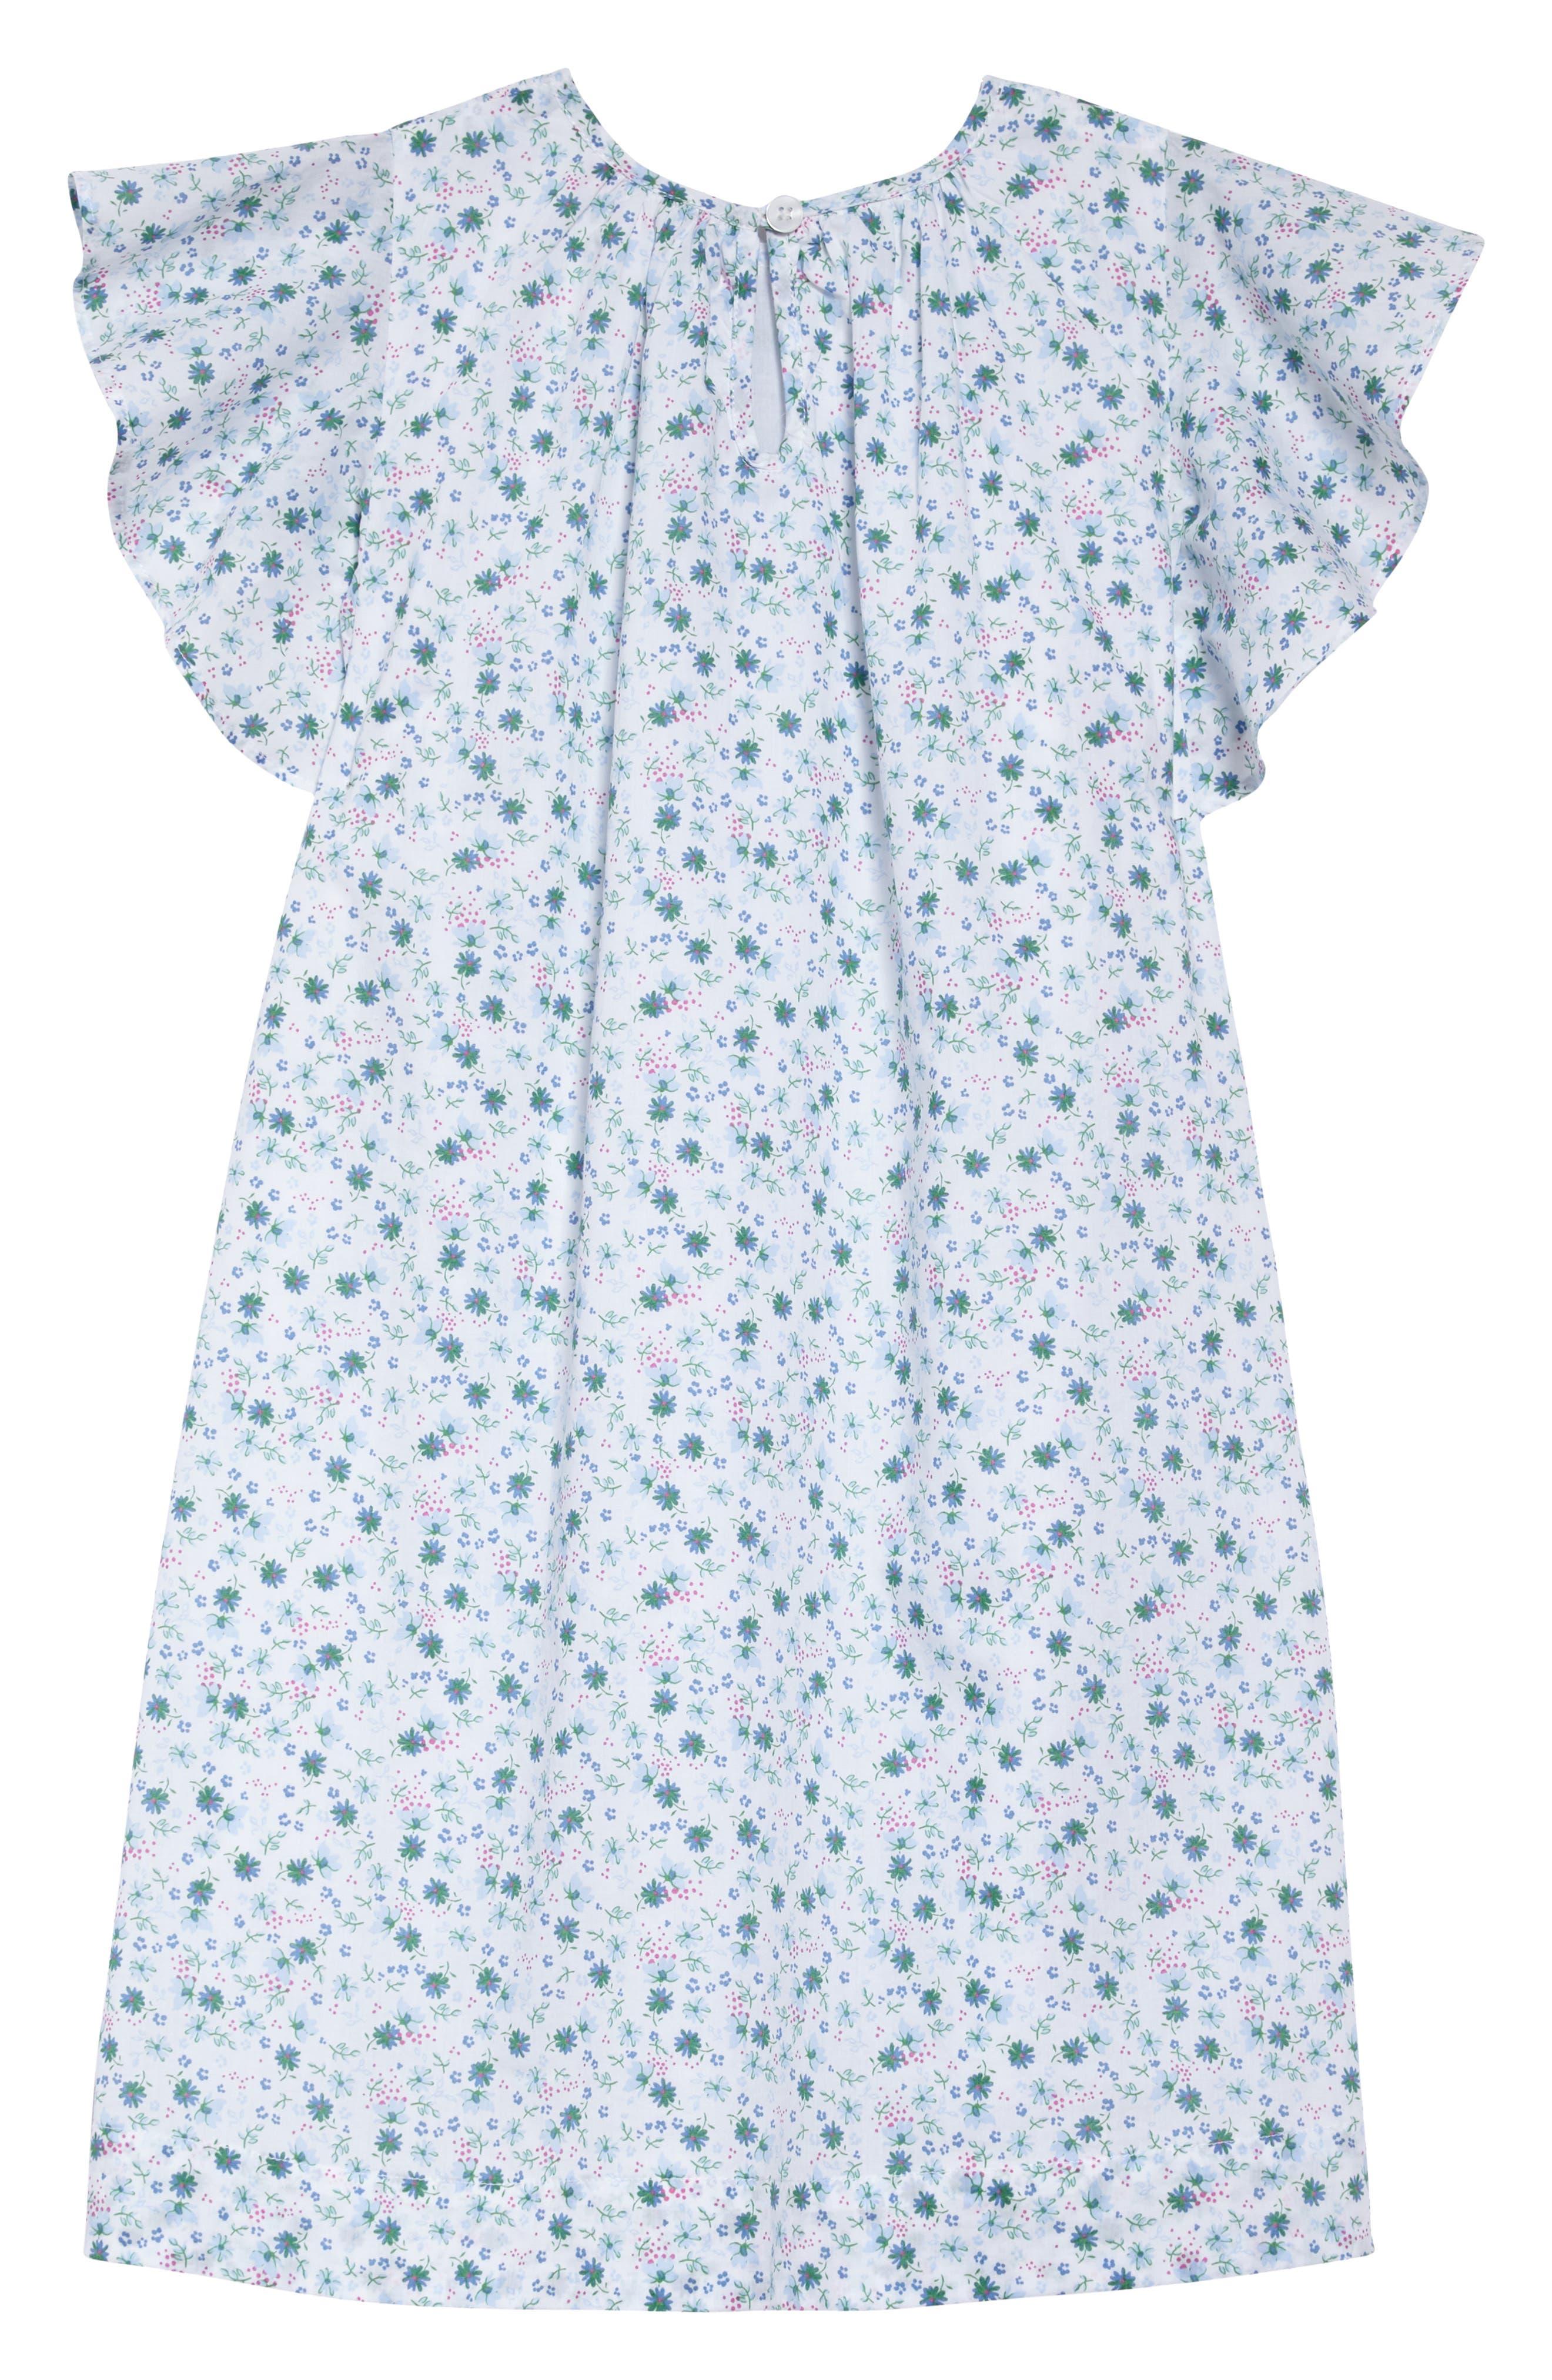 Floral Flutter Sleeve Dress,                             Alternate thumbnail 2, color,                             White Devon Floral